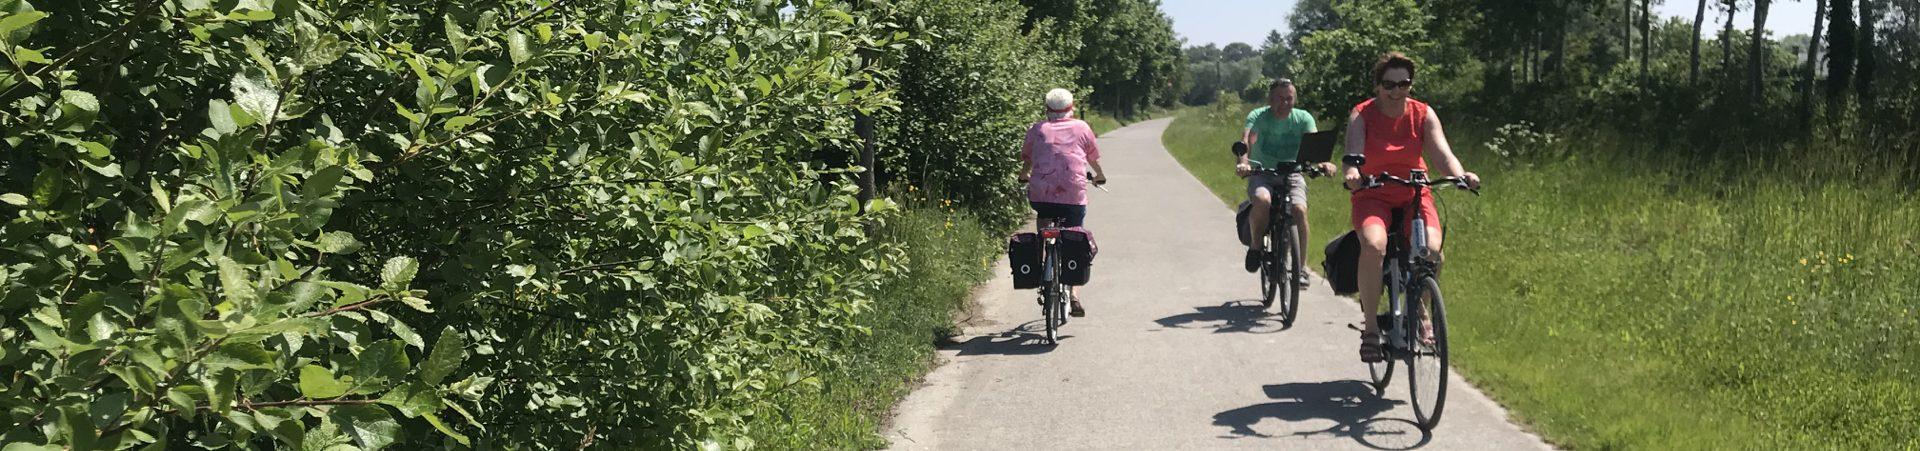 Fietsroute fietsblog review fietsers